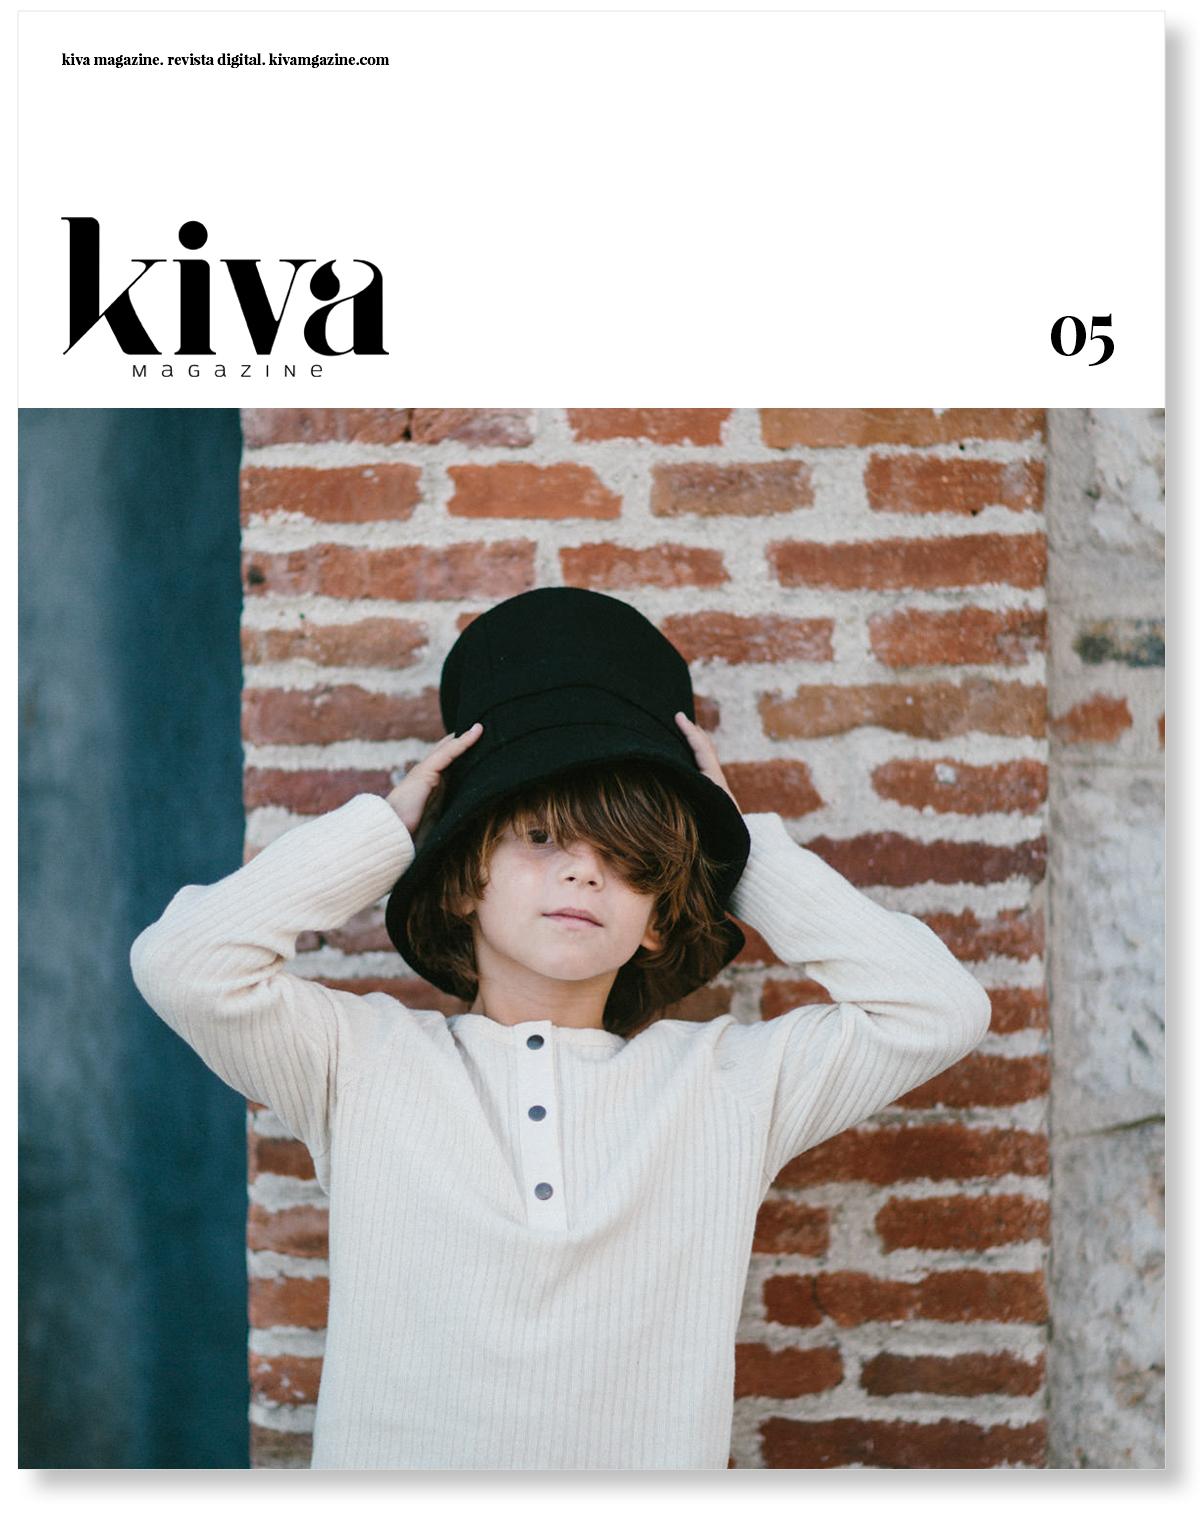 Quinto número Kiva magazine, portada